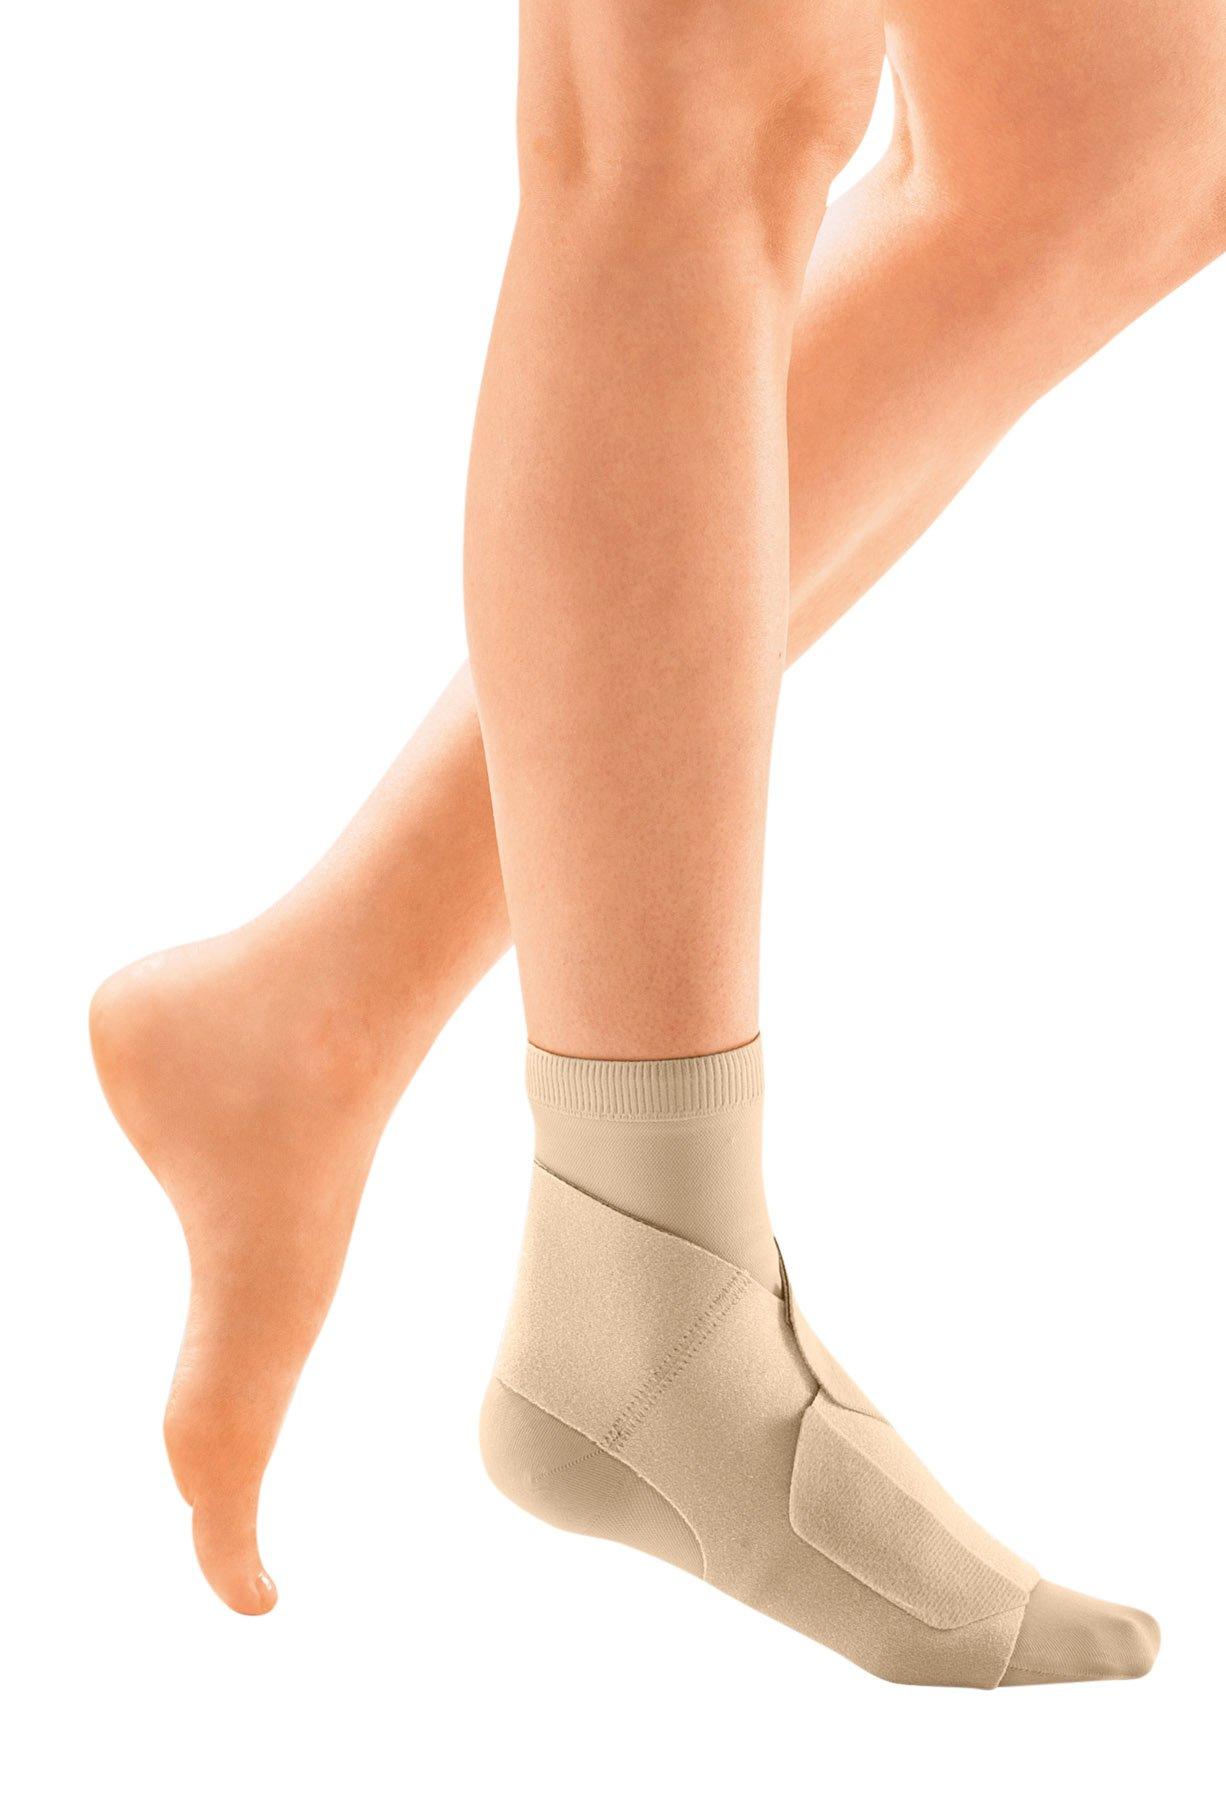 0b5b24b06a Amazon.com : circaid Compression Anklets providing mild, even ...